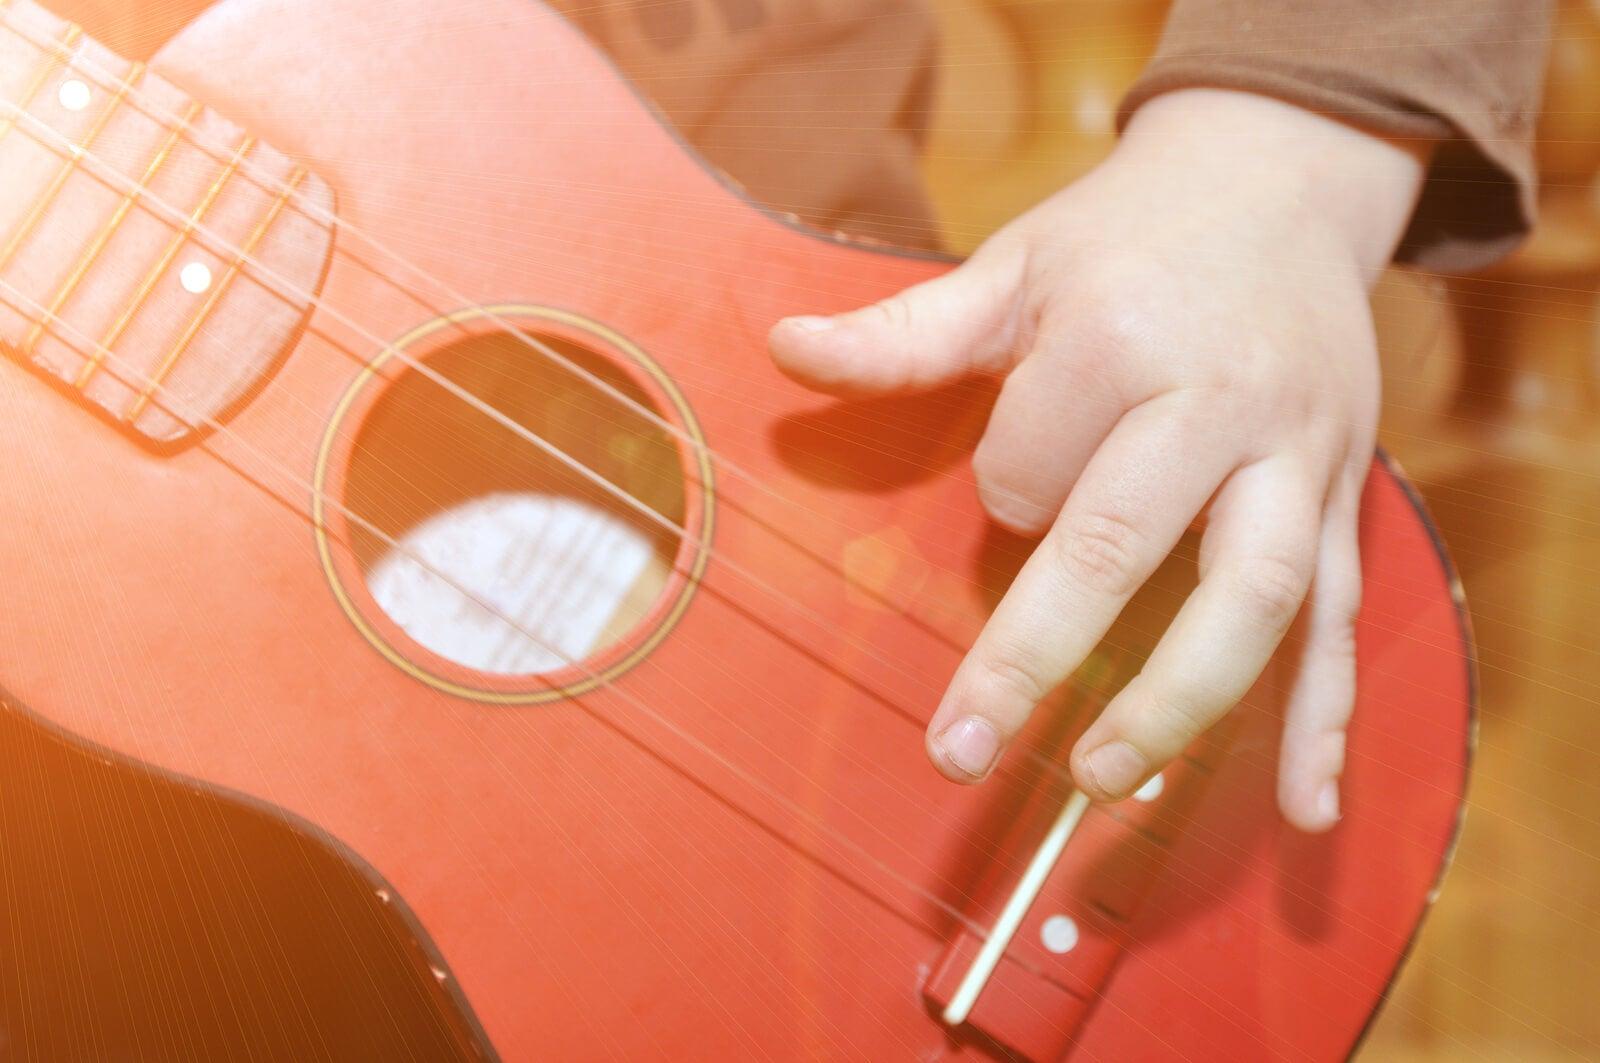 Niño tocando una guitarra de juguete.